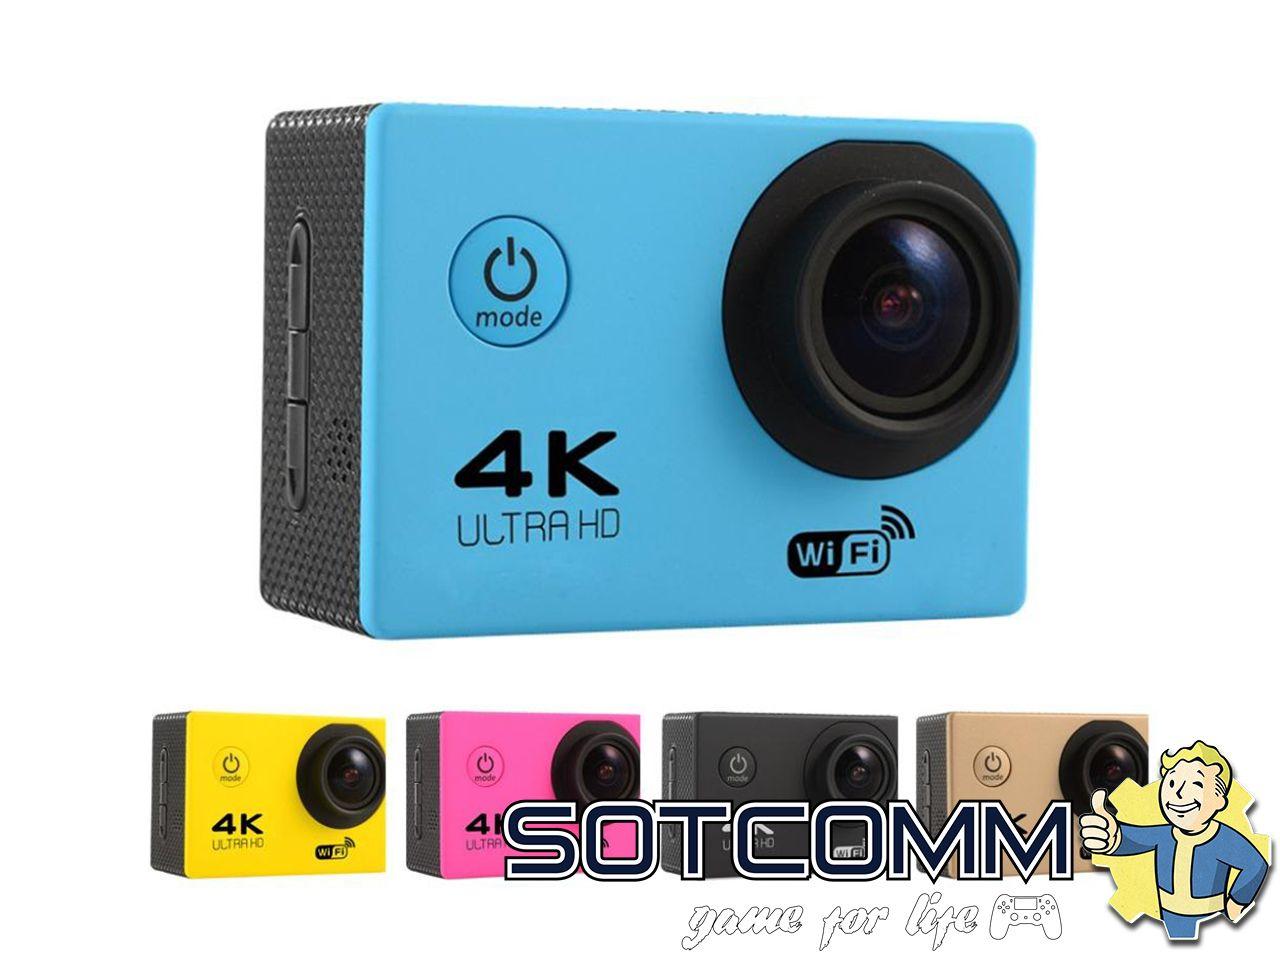 Action camera F60 Ultra HD 4K Wi-Fi купить в Челябинске